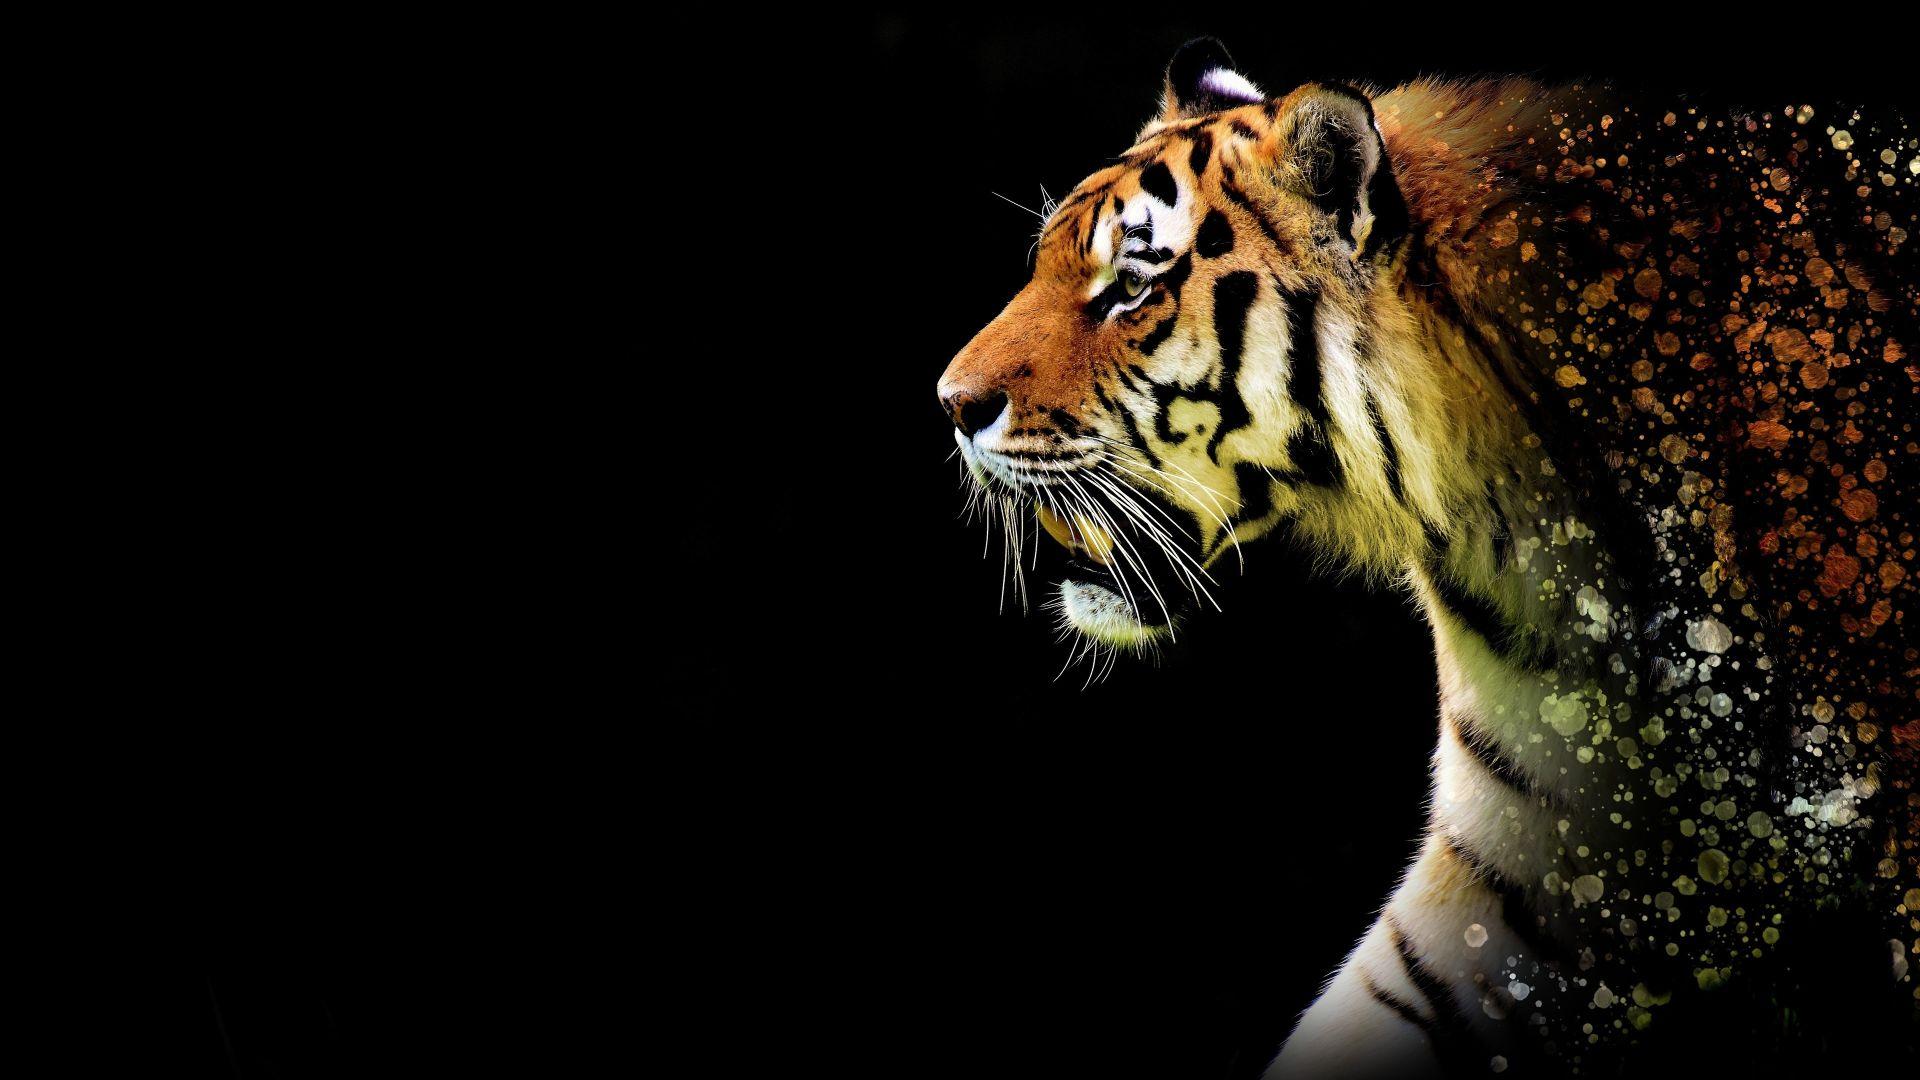 Tiger Art, Image